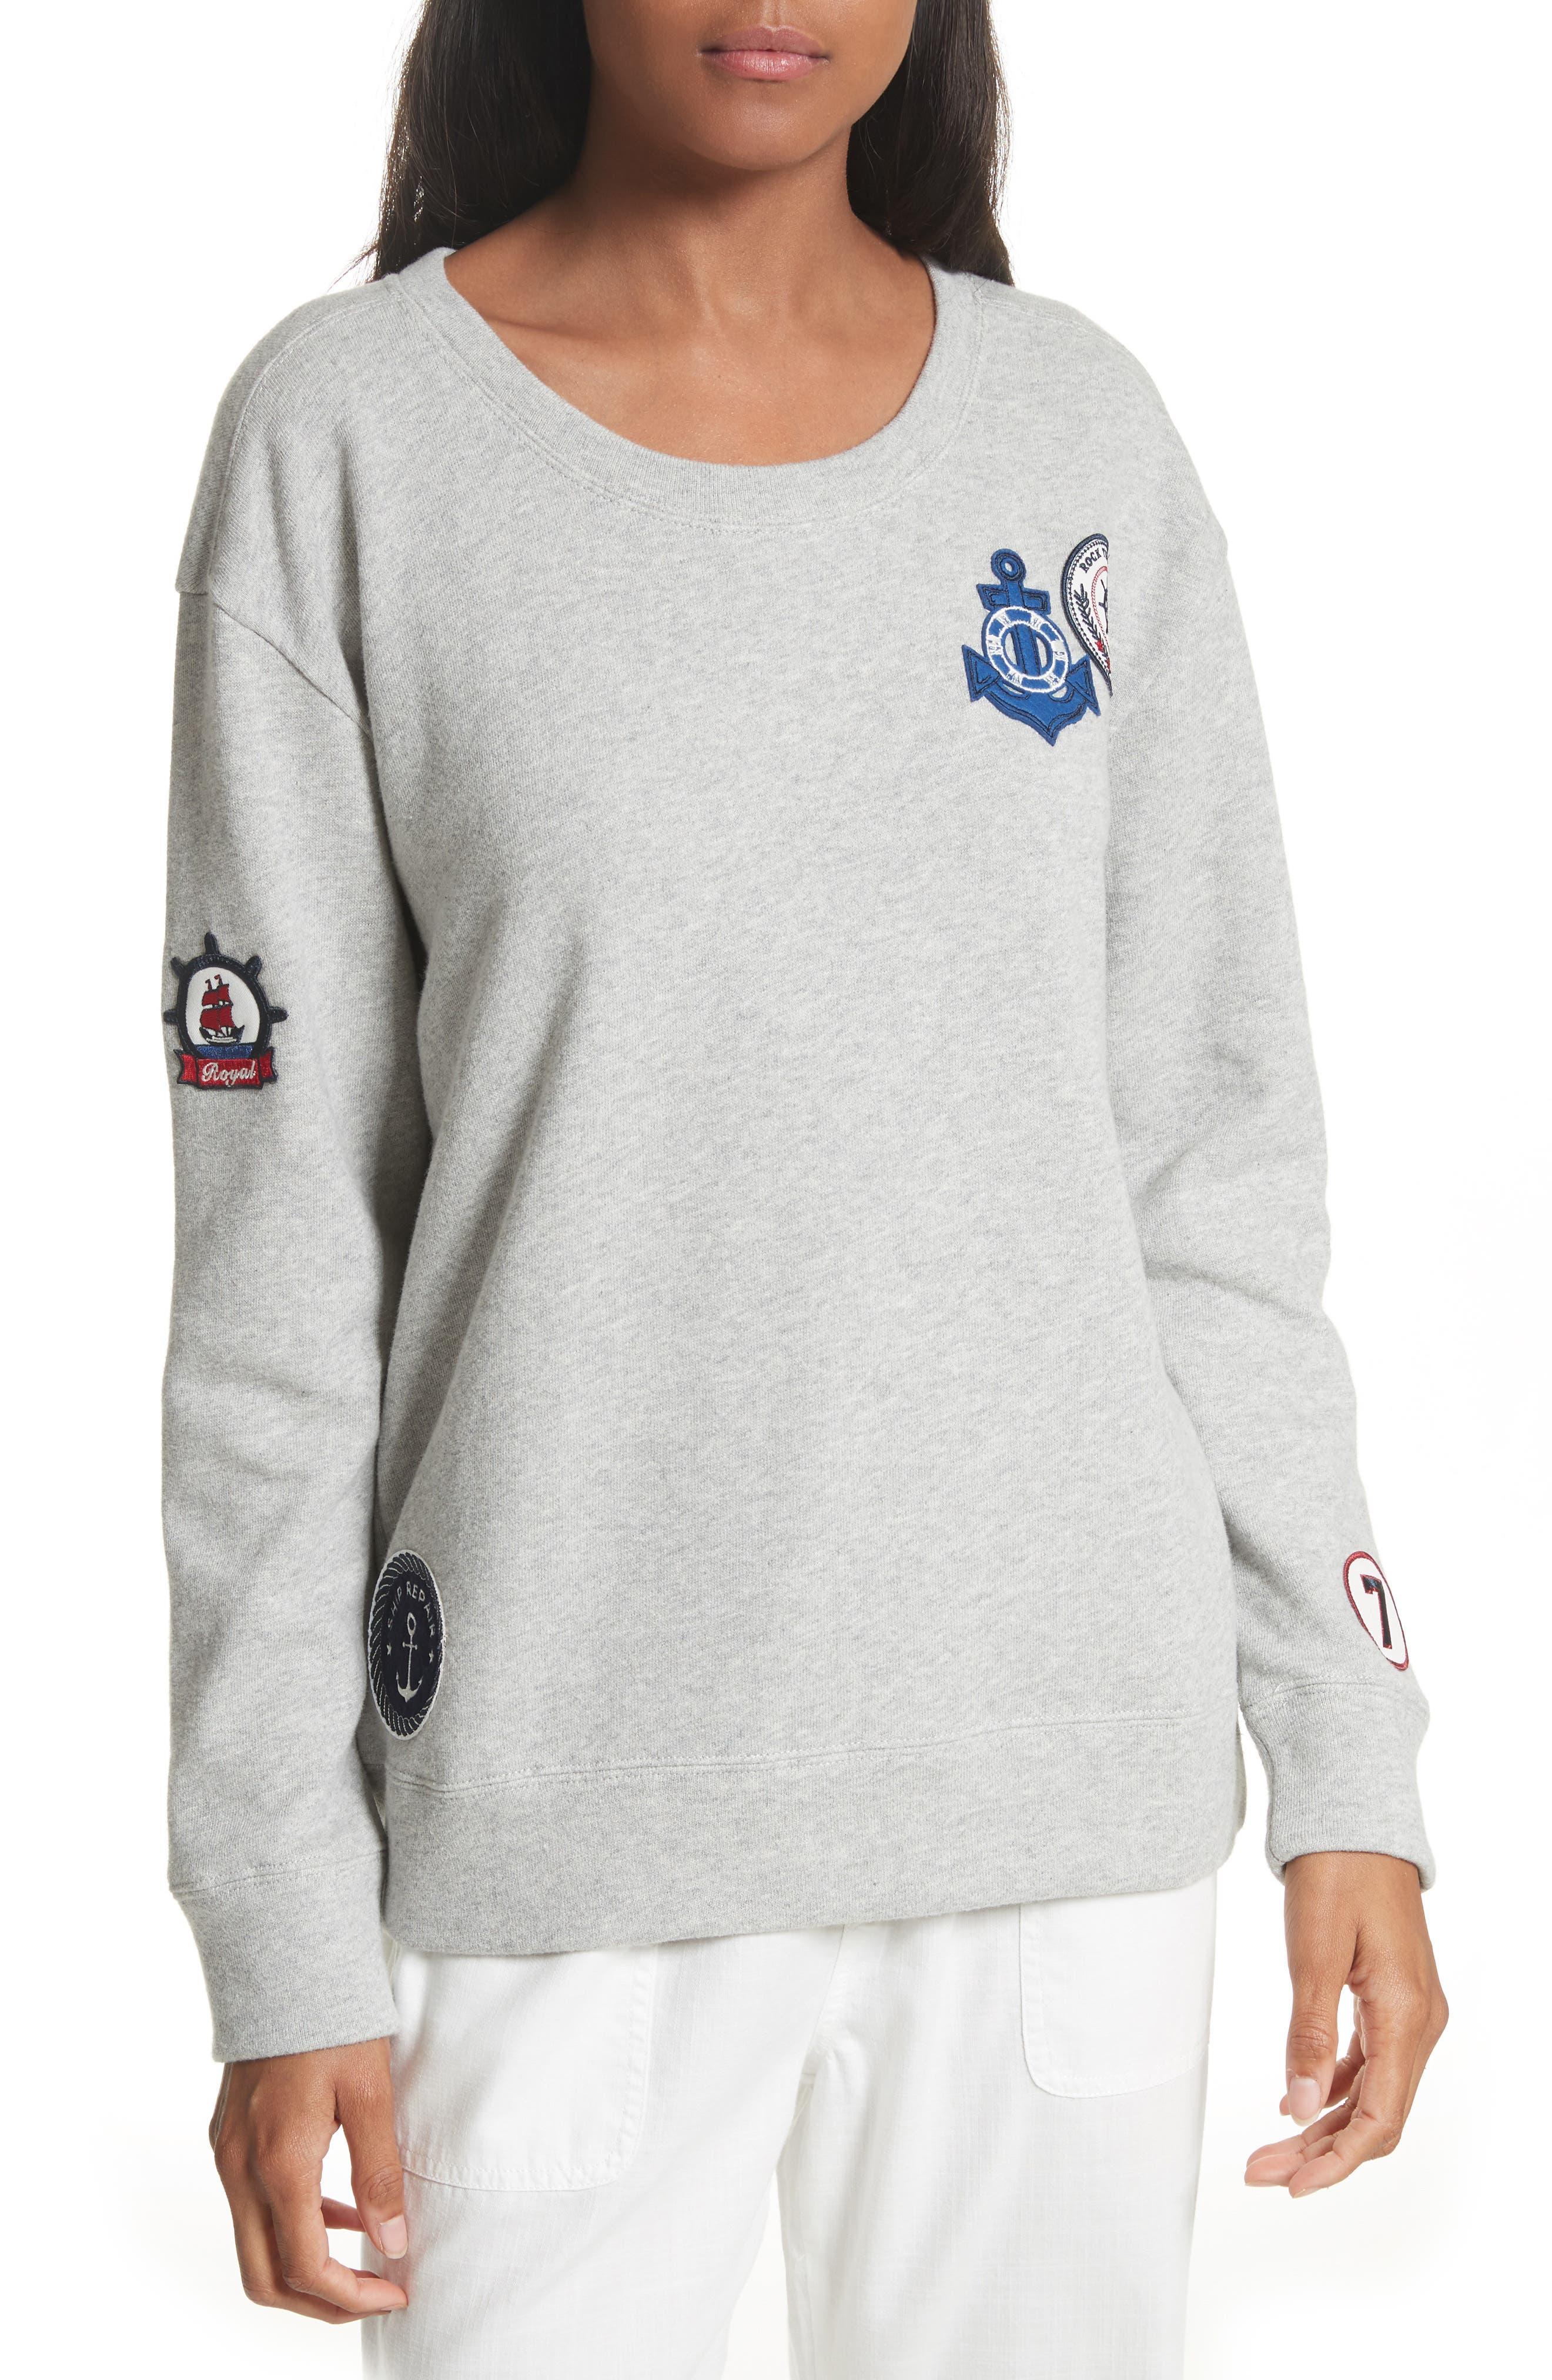 Soft Joie Rikke B Appliqué Sweatshirt